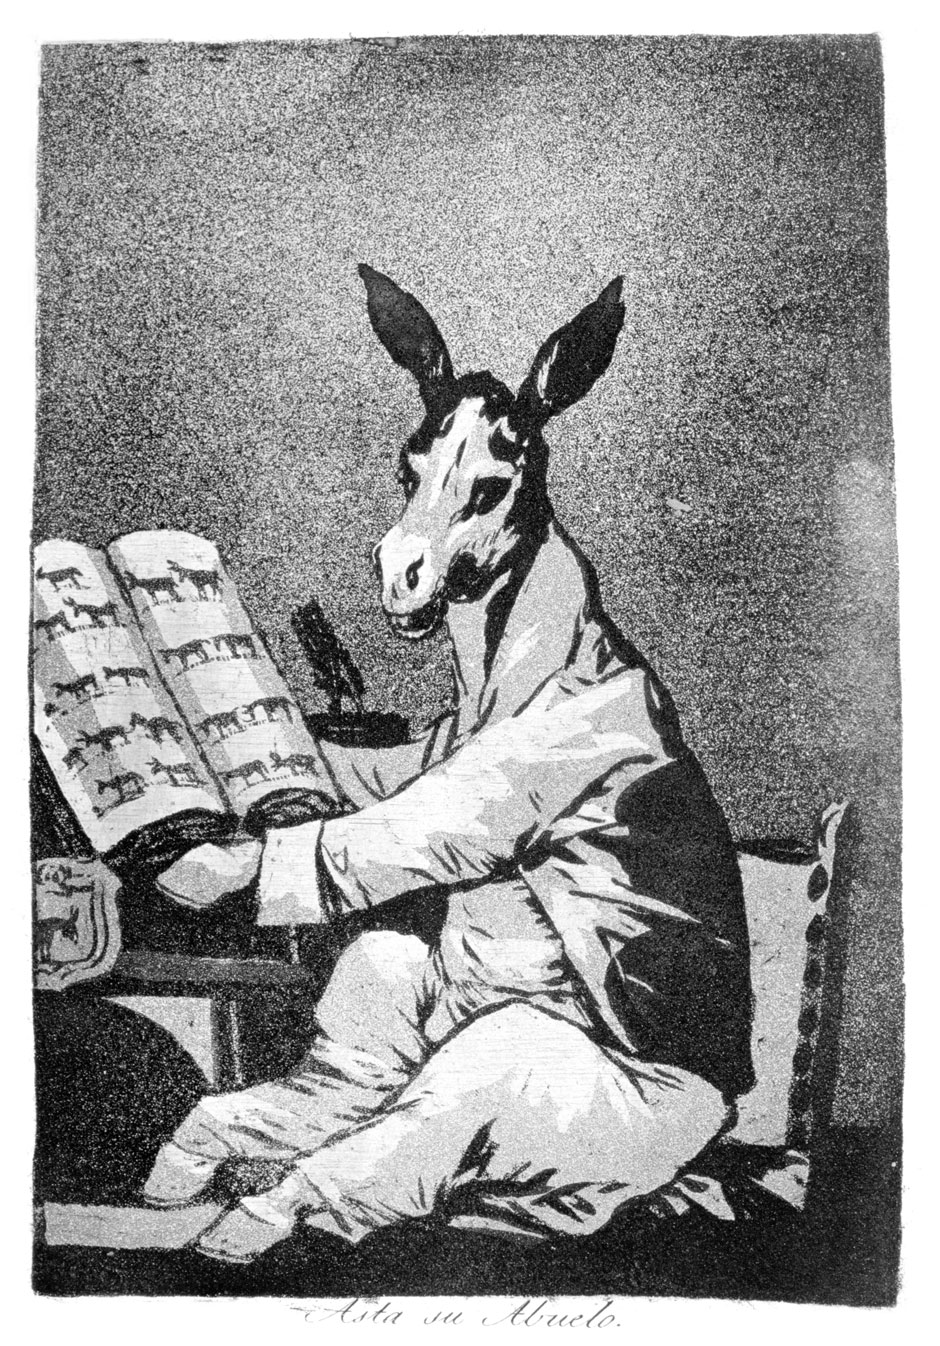 Francisco Goya: As Far back as his Grandfather, 1799